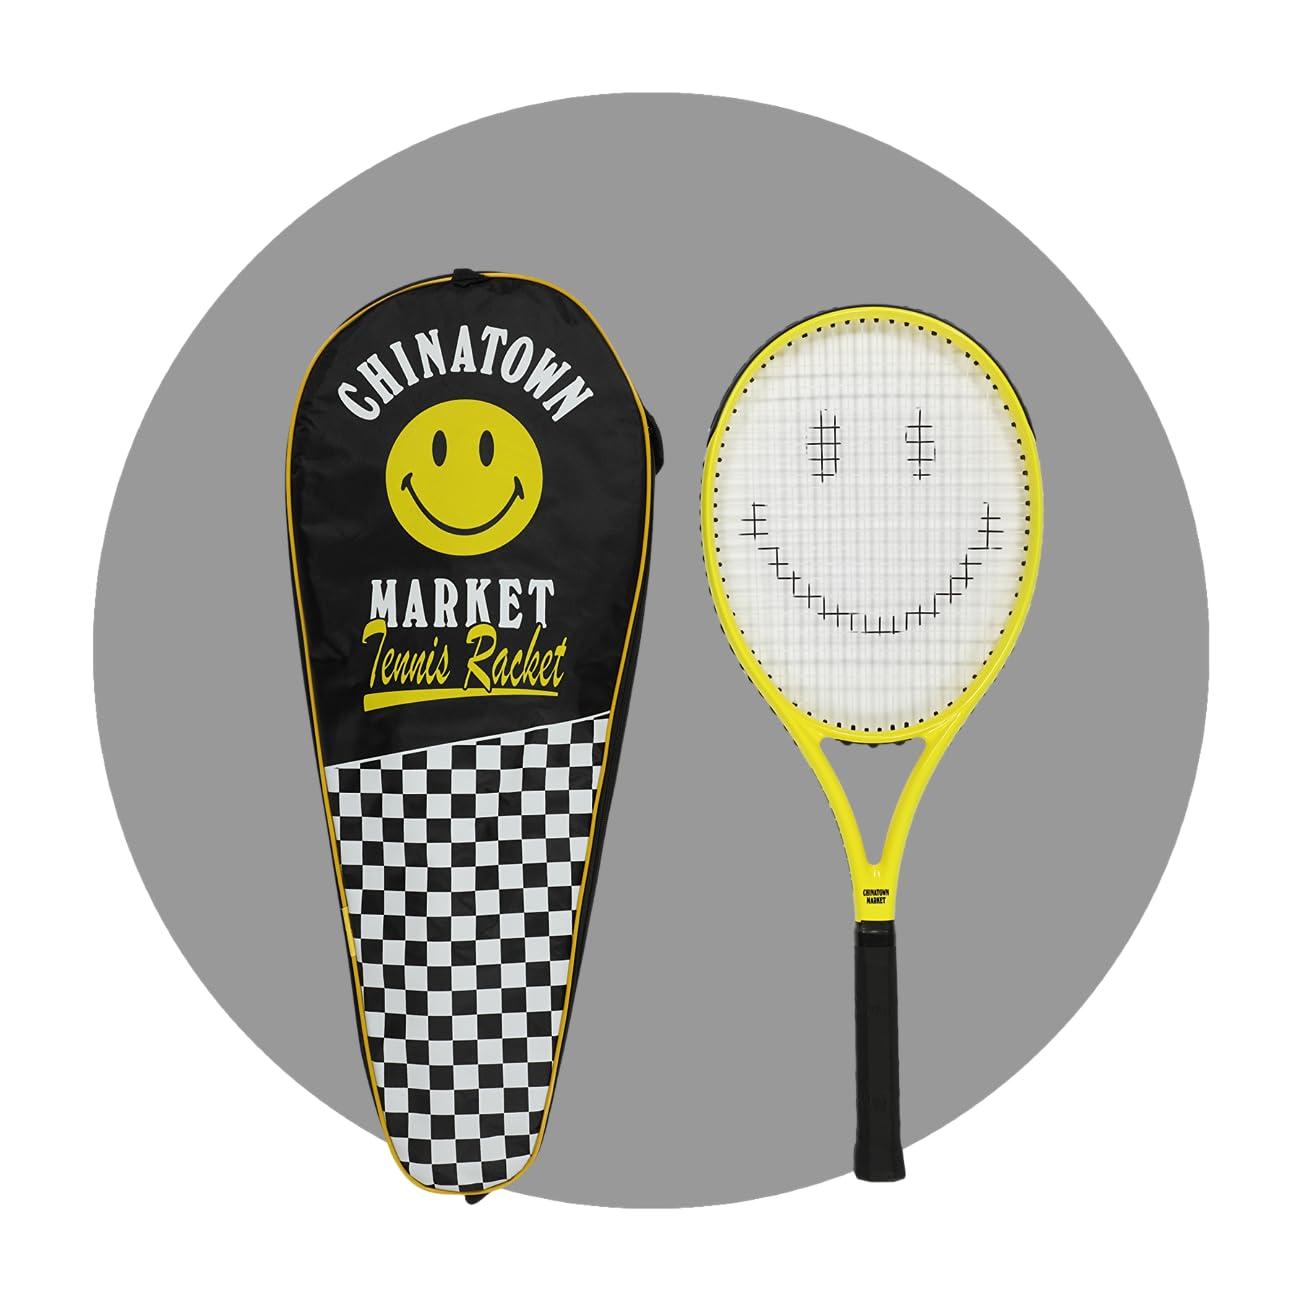 Chinatown Market Smiley Tennis Rackets